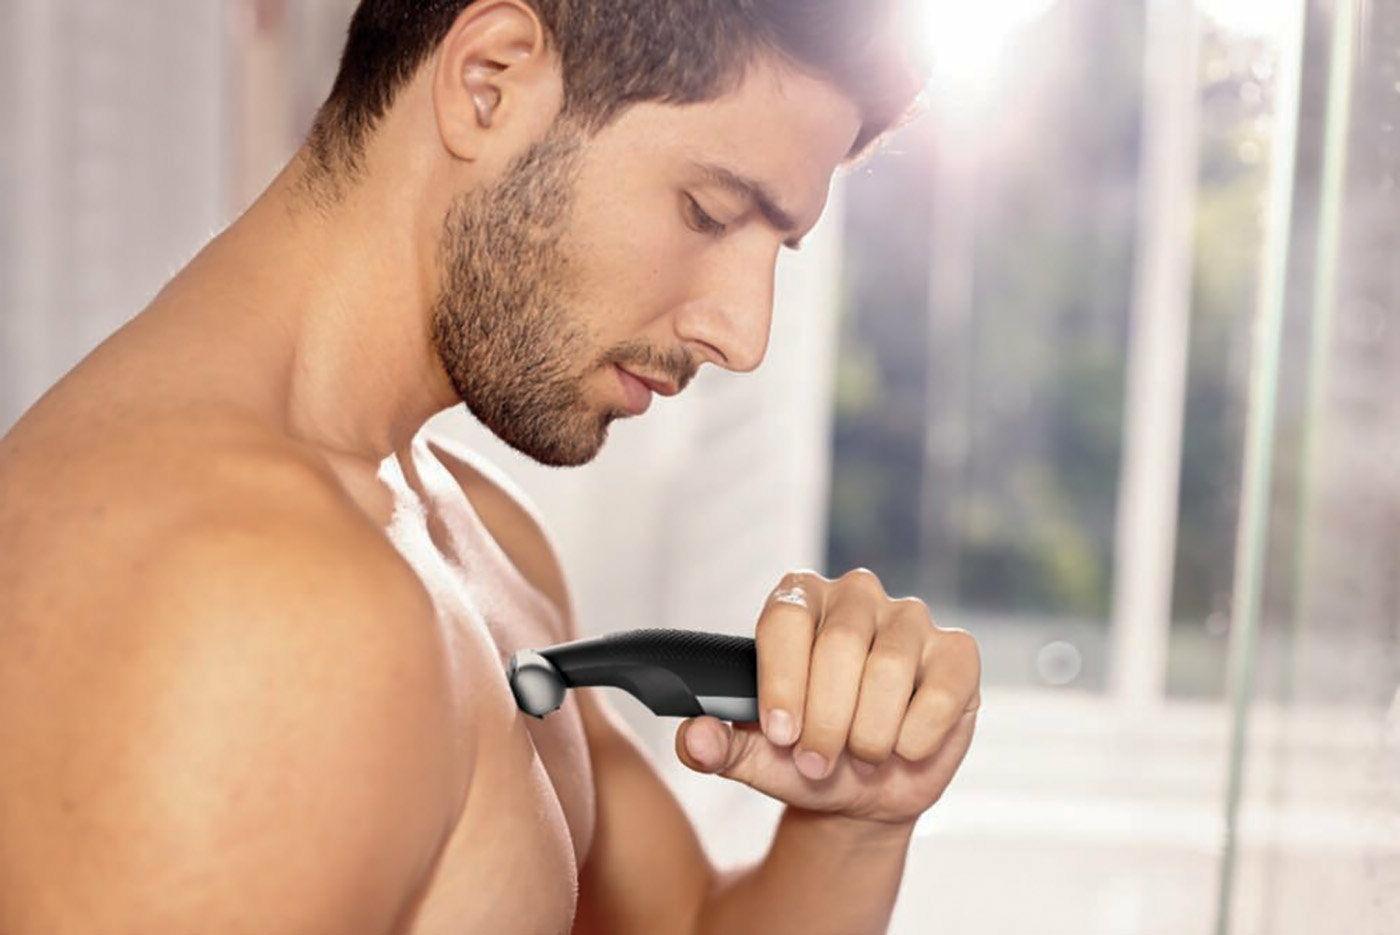 PHILIPS Bodygroom Shaver for removal